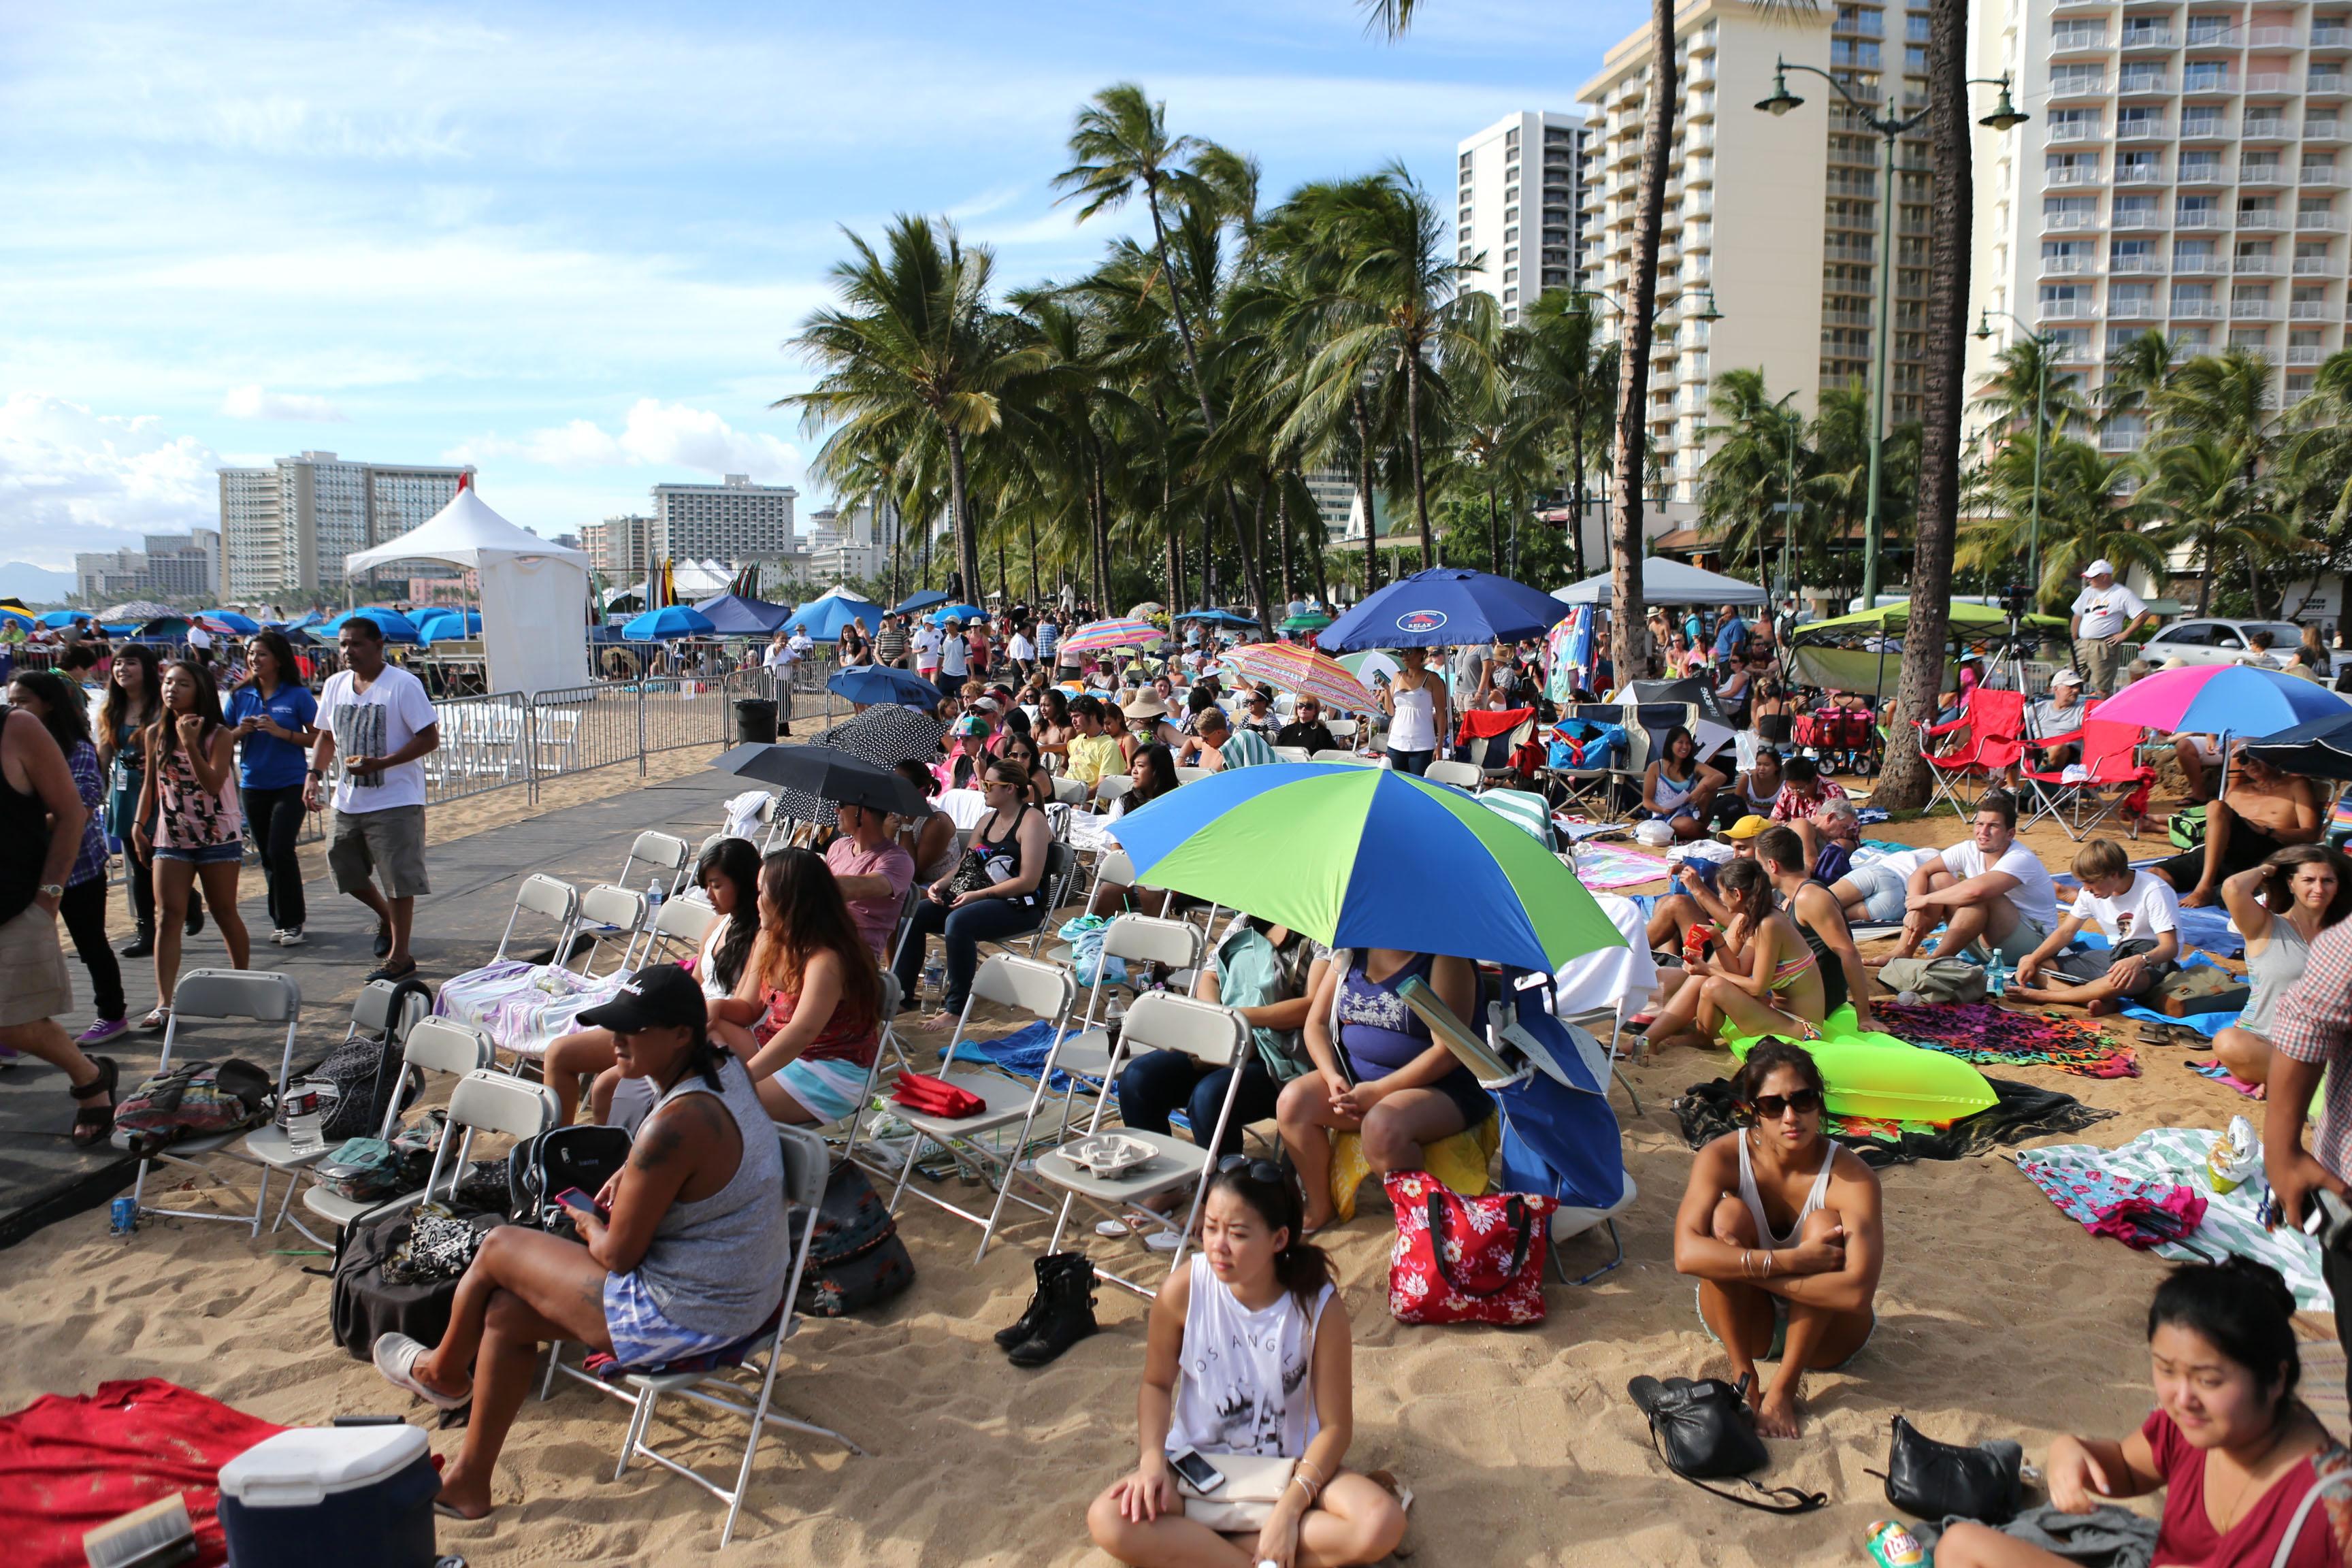 Hawaii Five-0 Sunset on the Beach